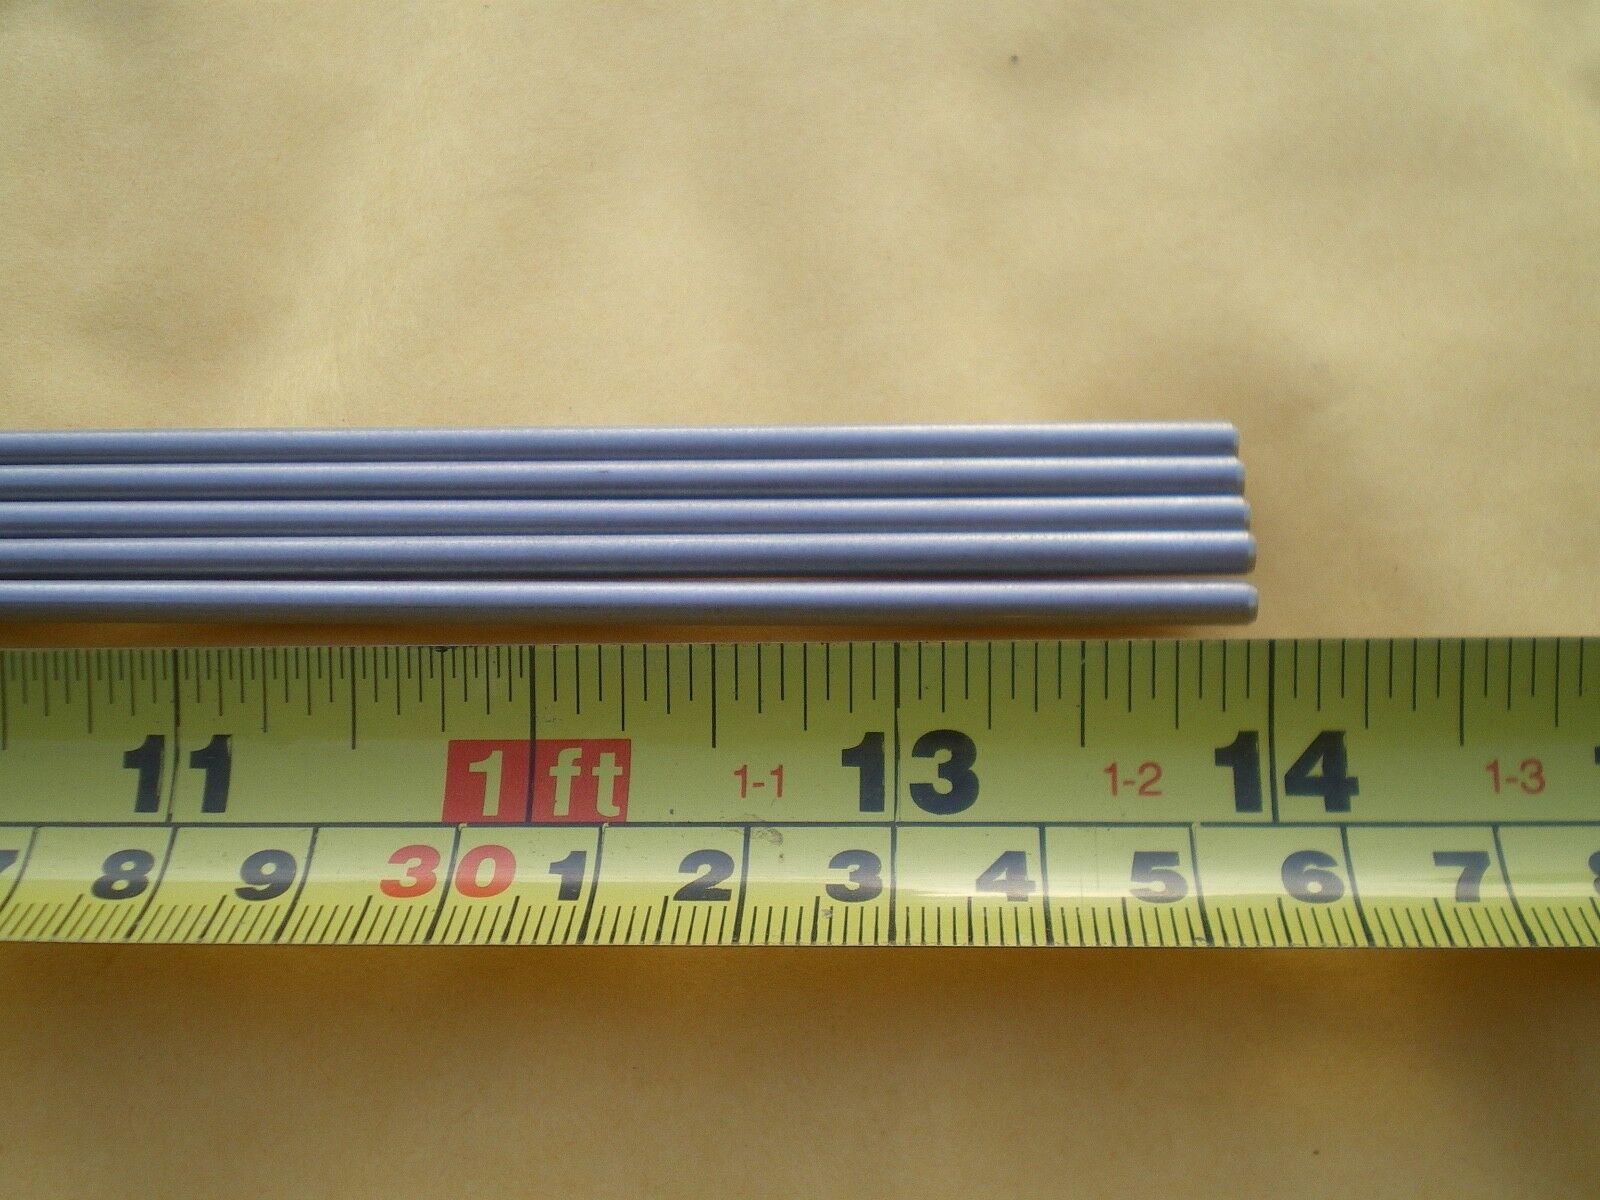 1 Pc. Length 17-4PH Stainless Steel Round Rod.156 Diameter x 3 Ft